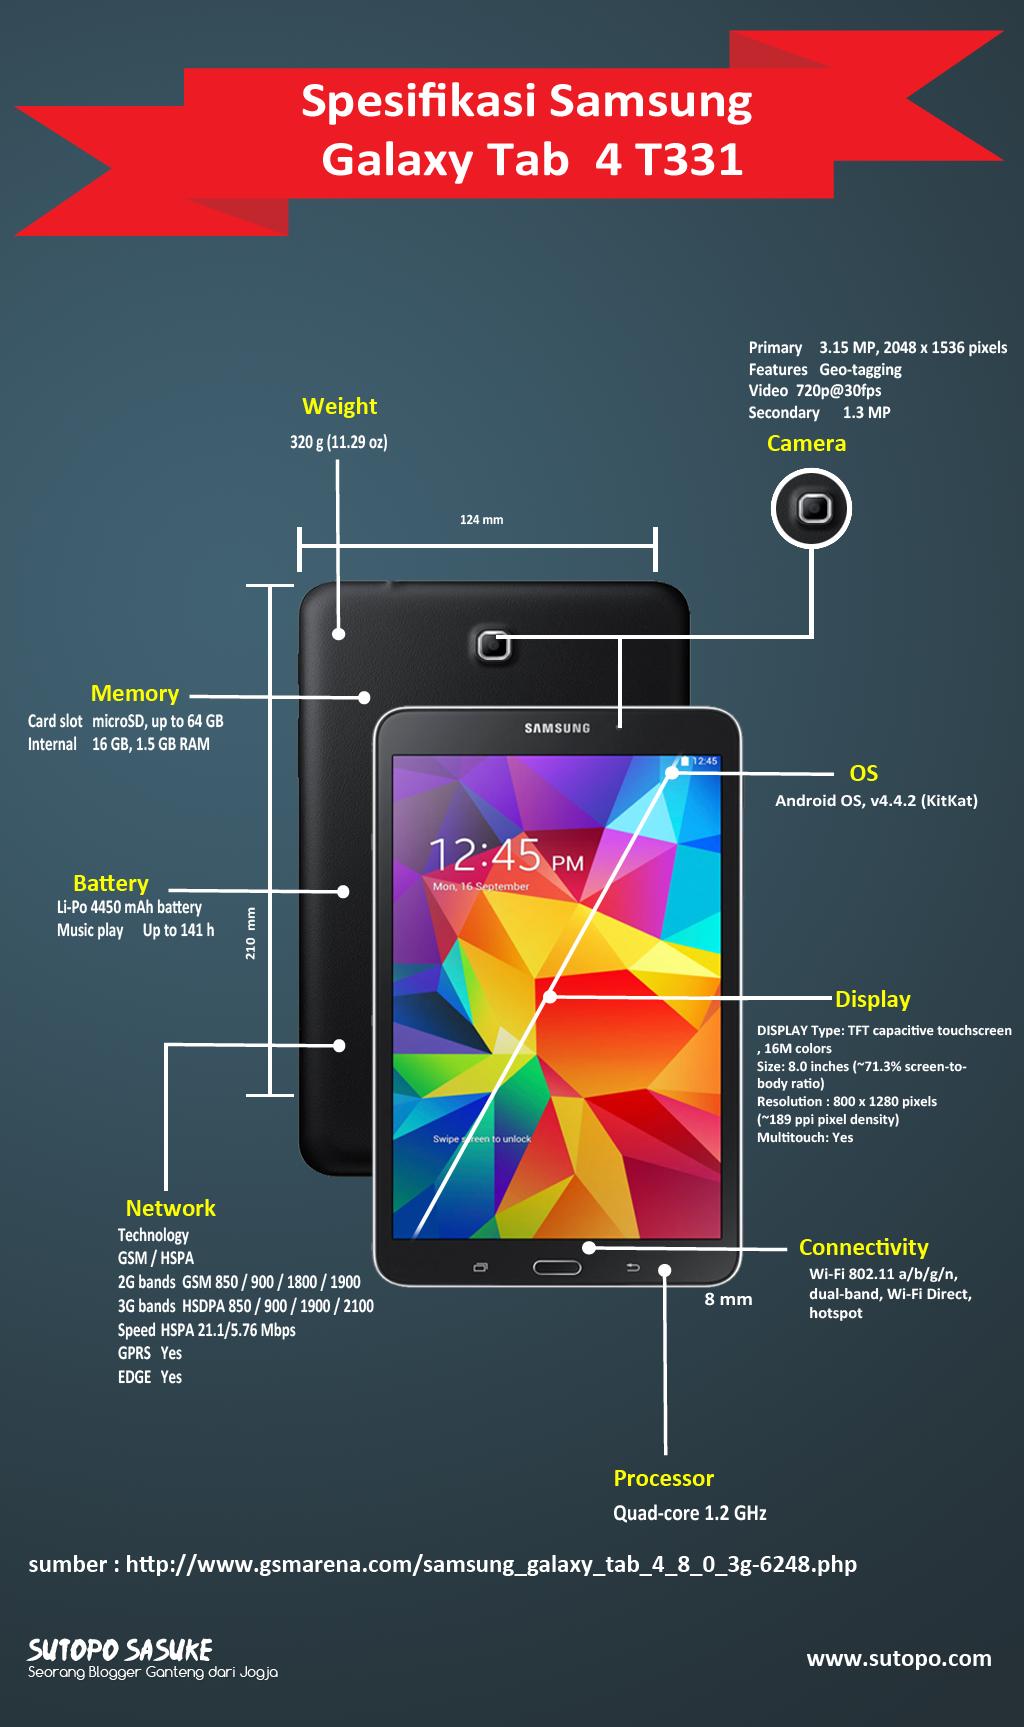 Spesifikasi Samsung Galaxy Tab 4 8.0 3G SM-T331